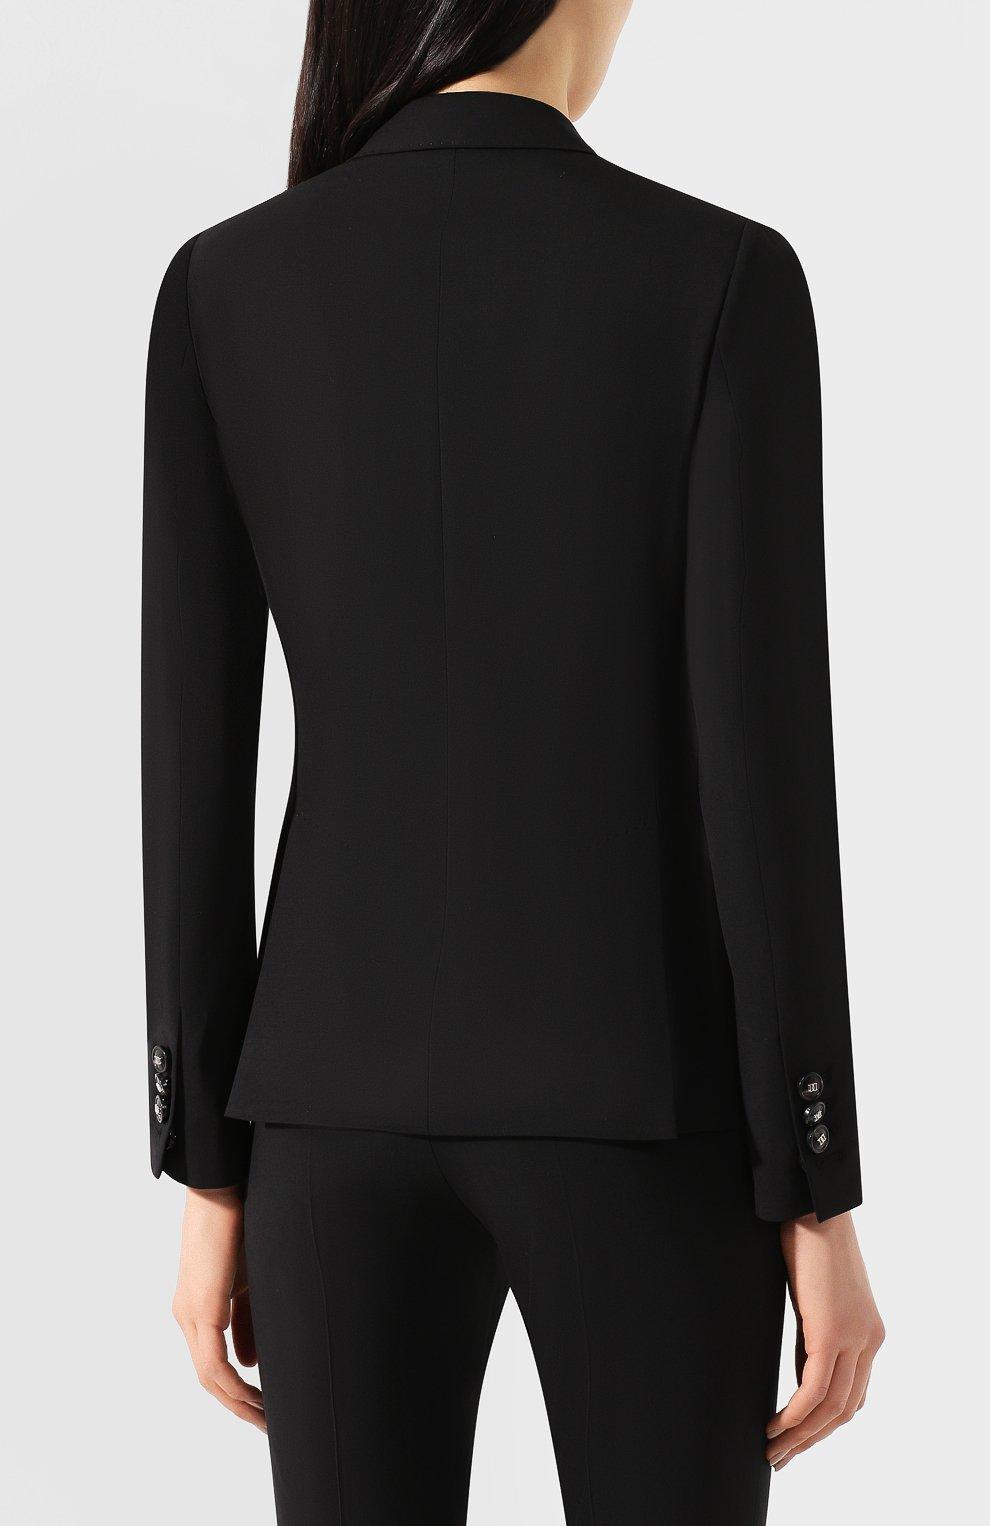 Женский шерстяной костюм DSQUARED2 черного цвета, арт. S75FT0201/S40320 | Фото 3